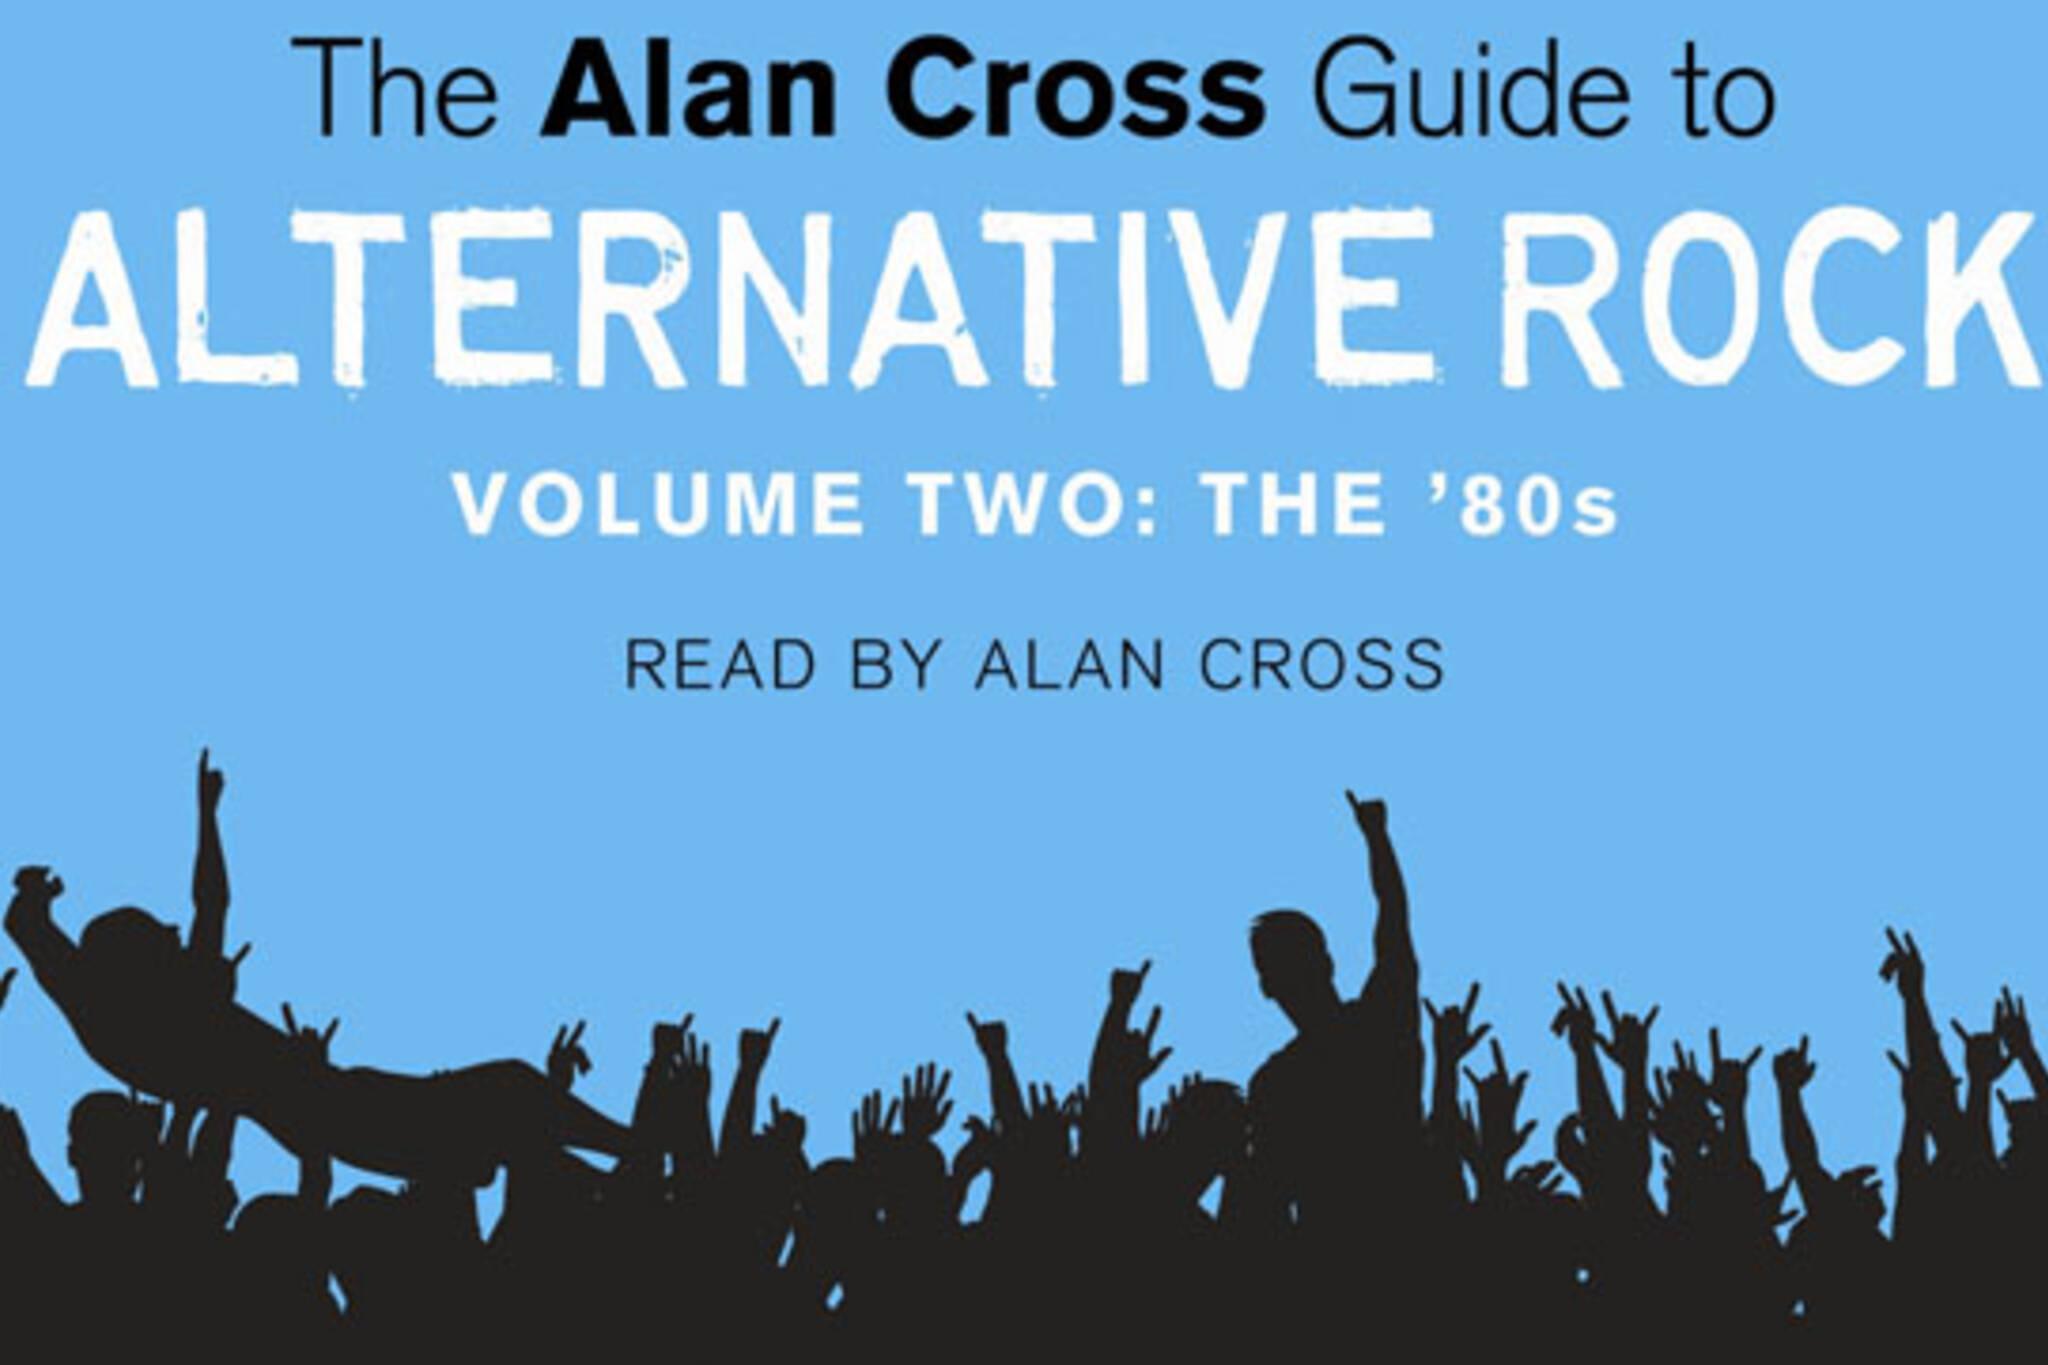 Alan Cross Avoids The Sophomore Slump